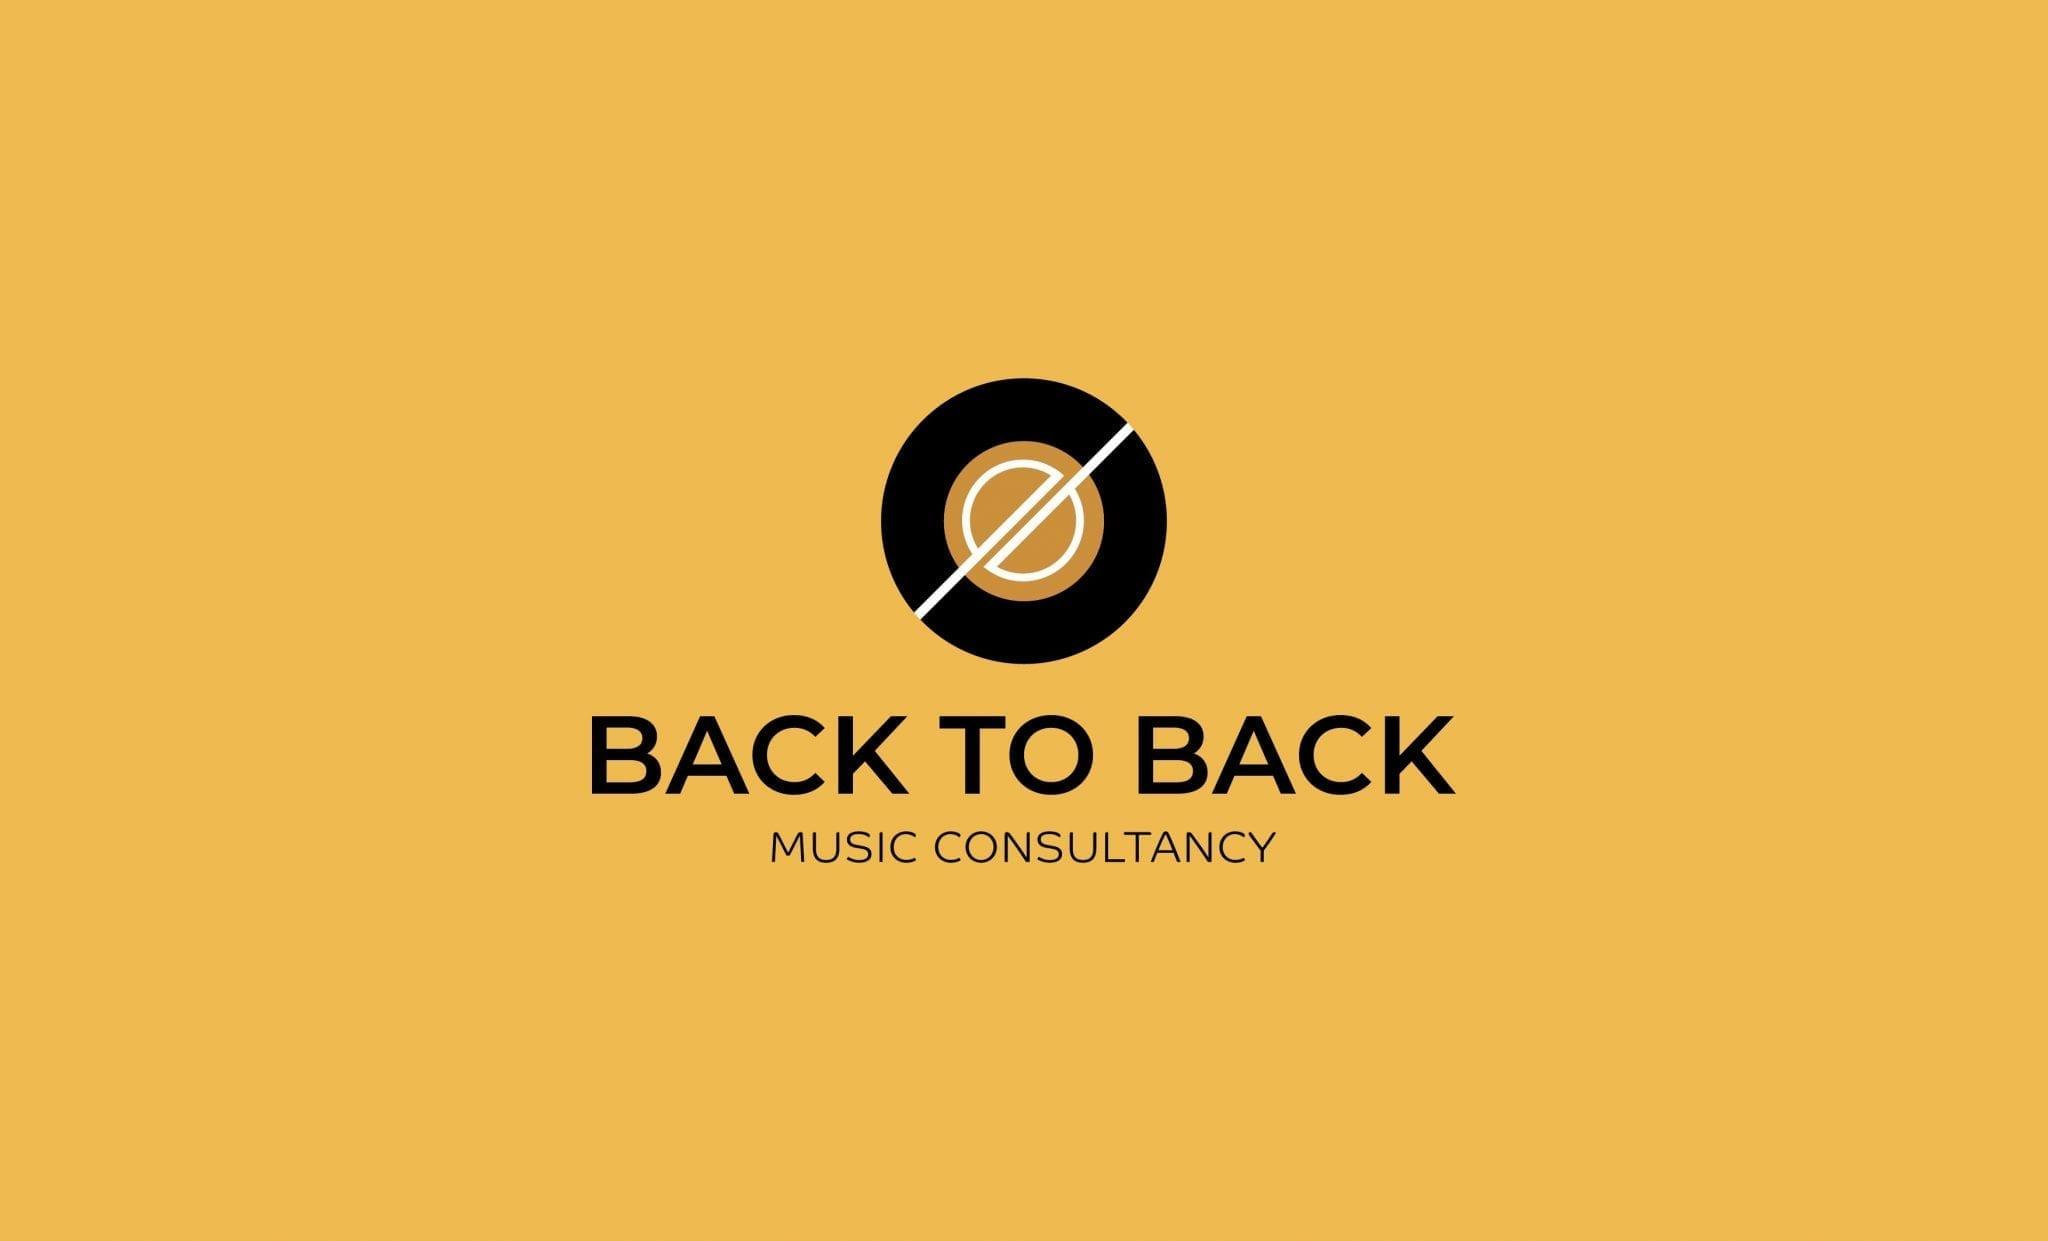 Back to Back Branding Guidelines3